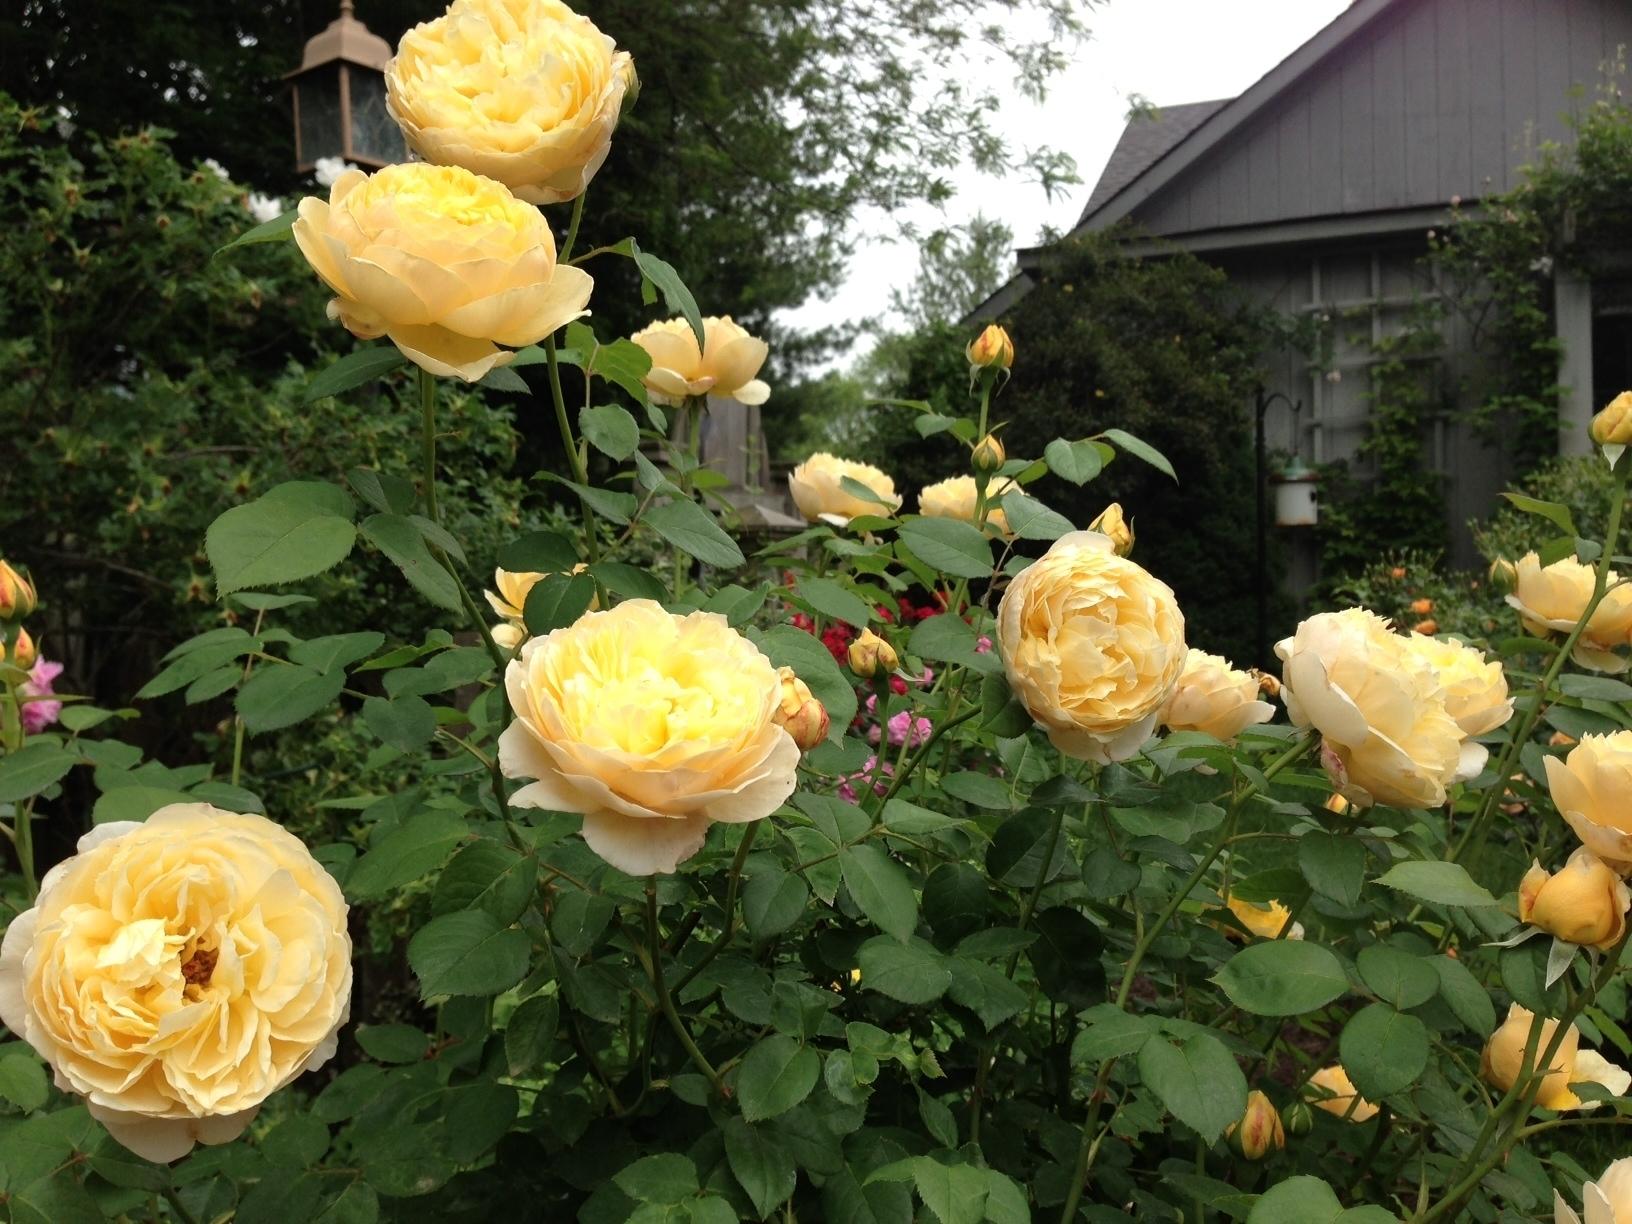 Rose Da Taglio Rifiorenti rose inglesi - piante da giardino - rose inglesi caratteristiche